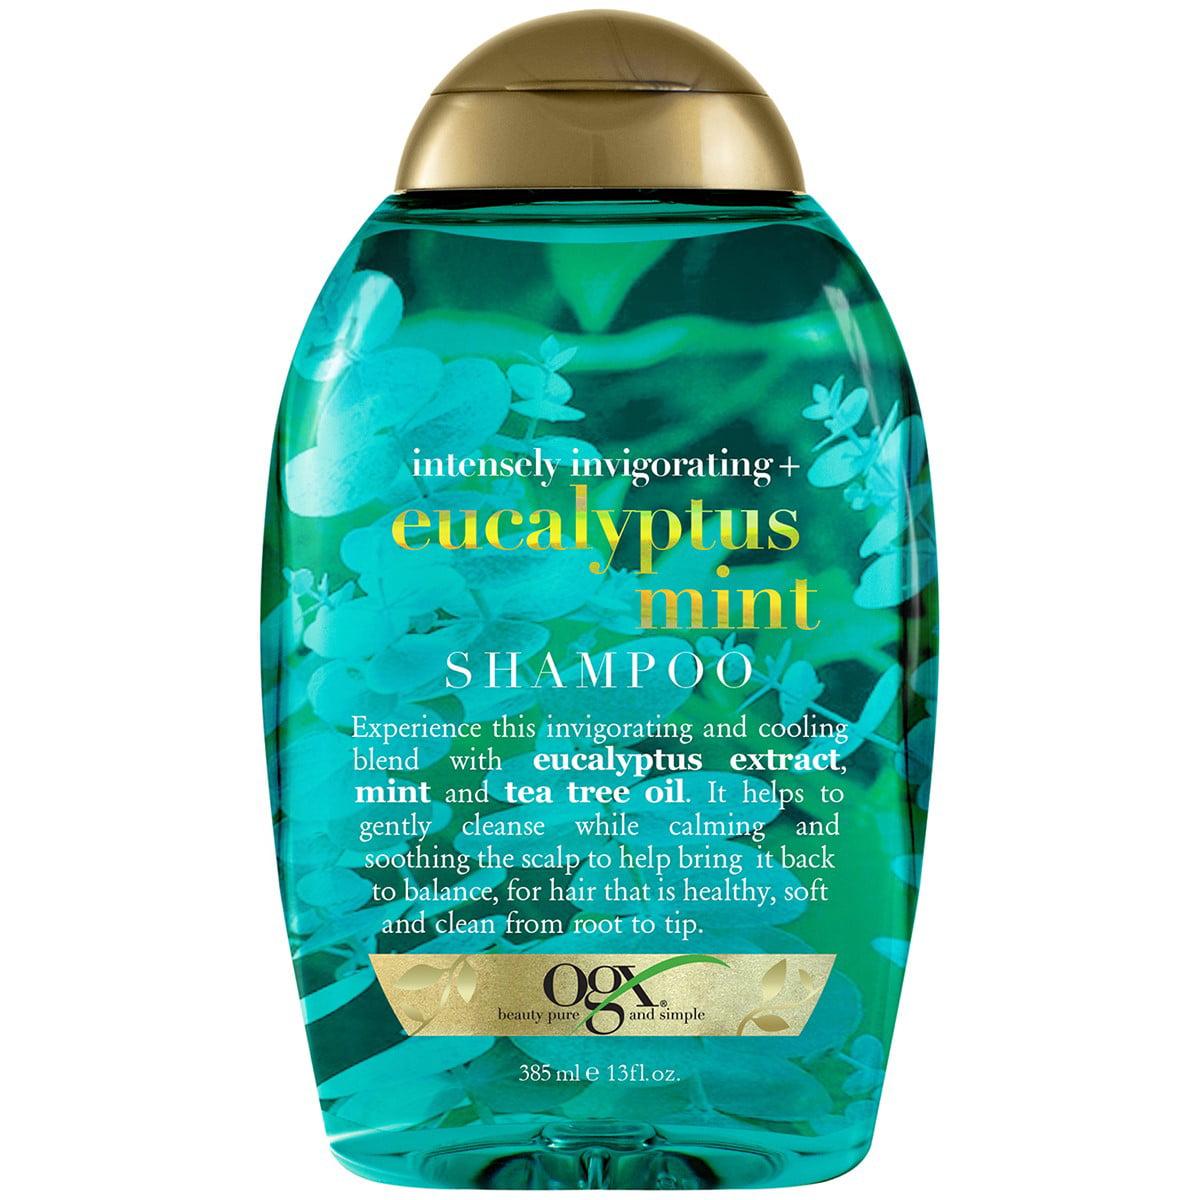 OGX Intensely Invigorating Eucalyptus Mint Shampoo, 13 Oz